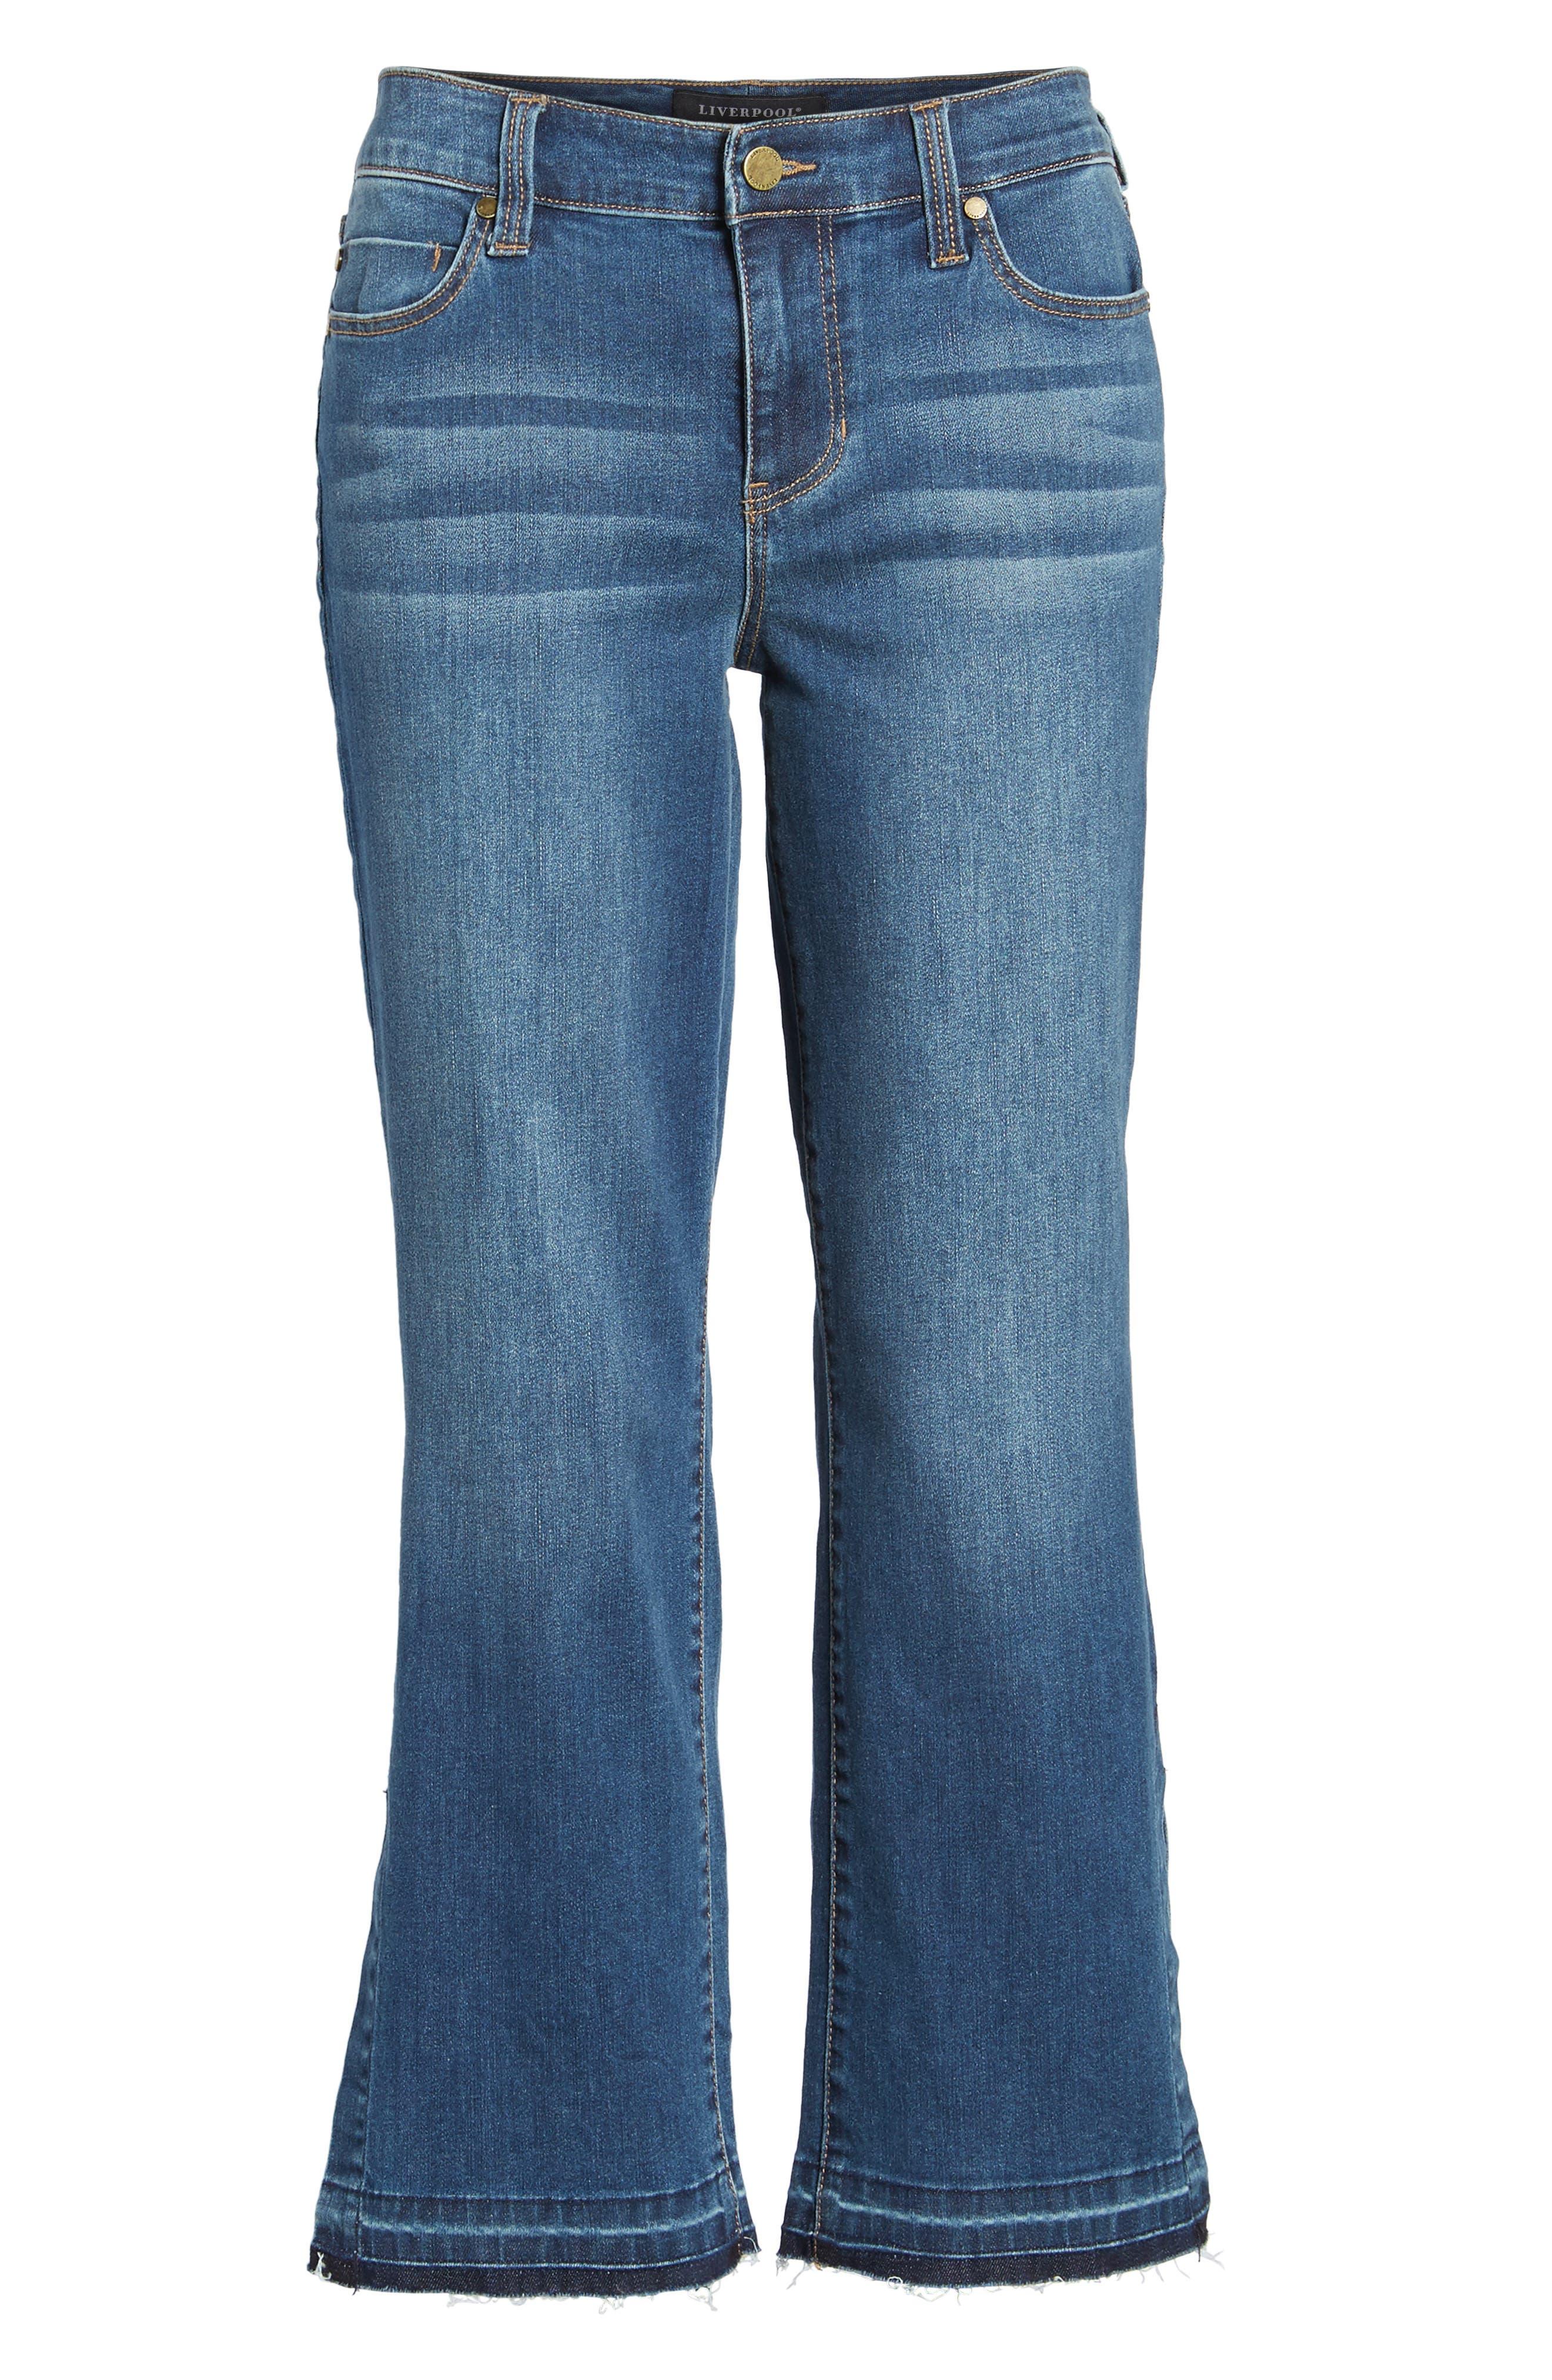 Tabitha Release Hem Crop Jeans,                             Alternate thumbnail 6, color,                             Montauk Mid Blue